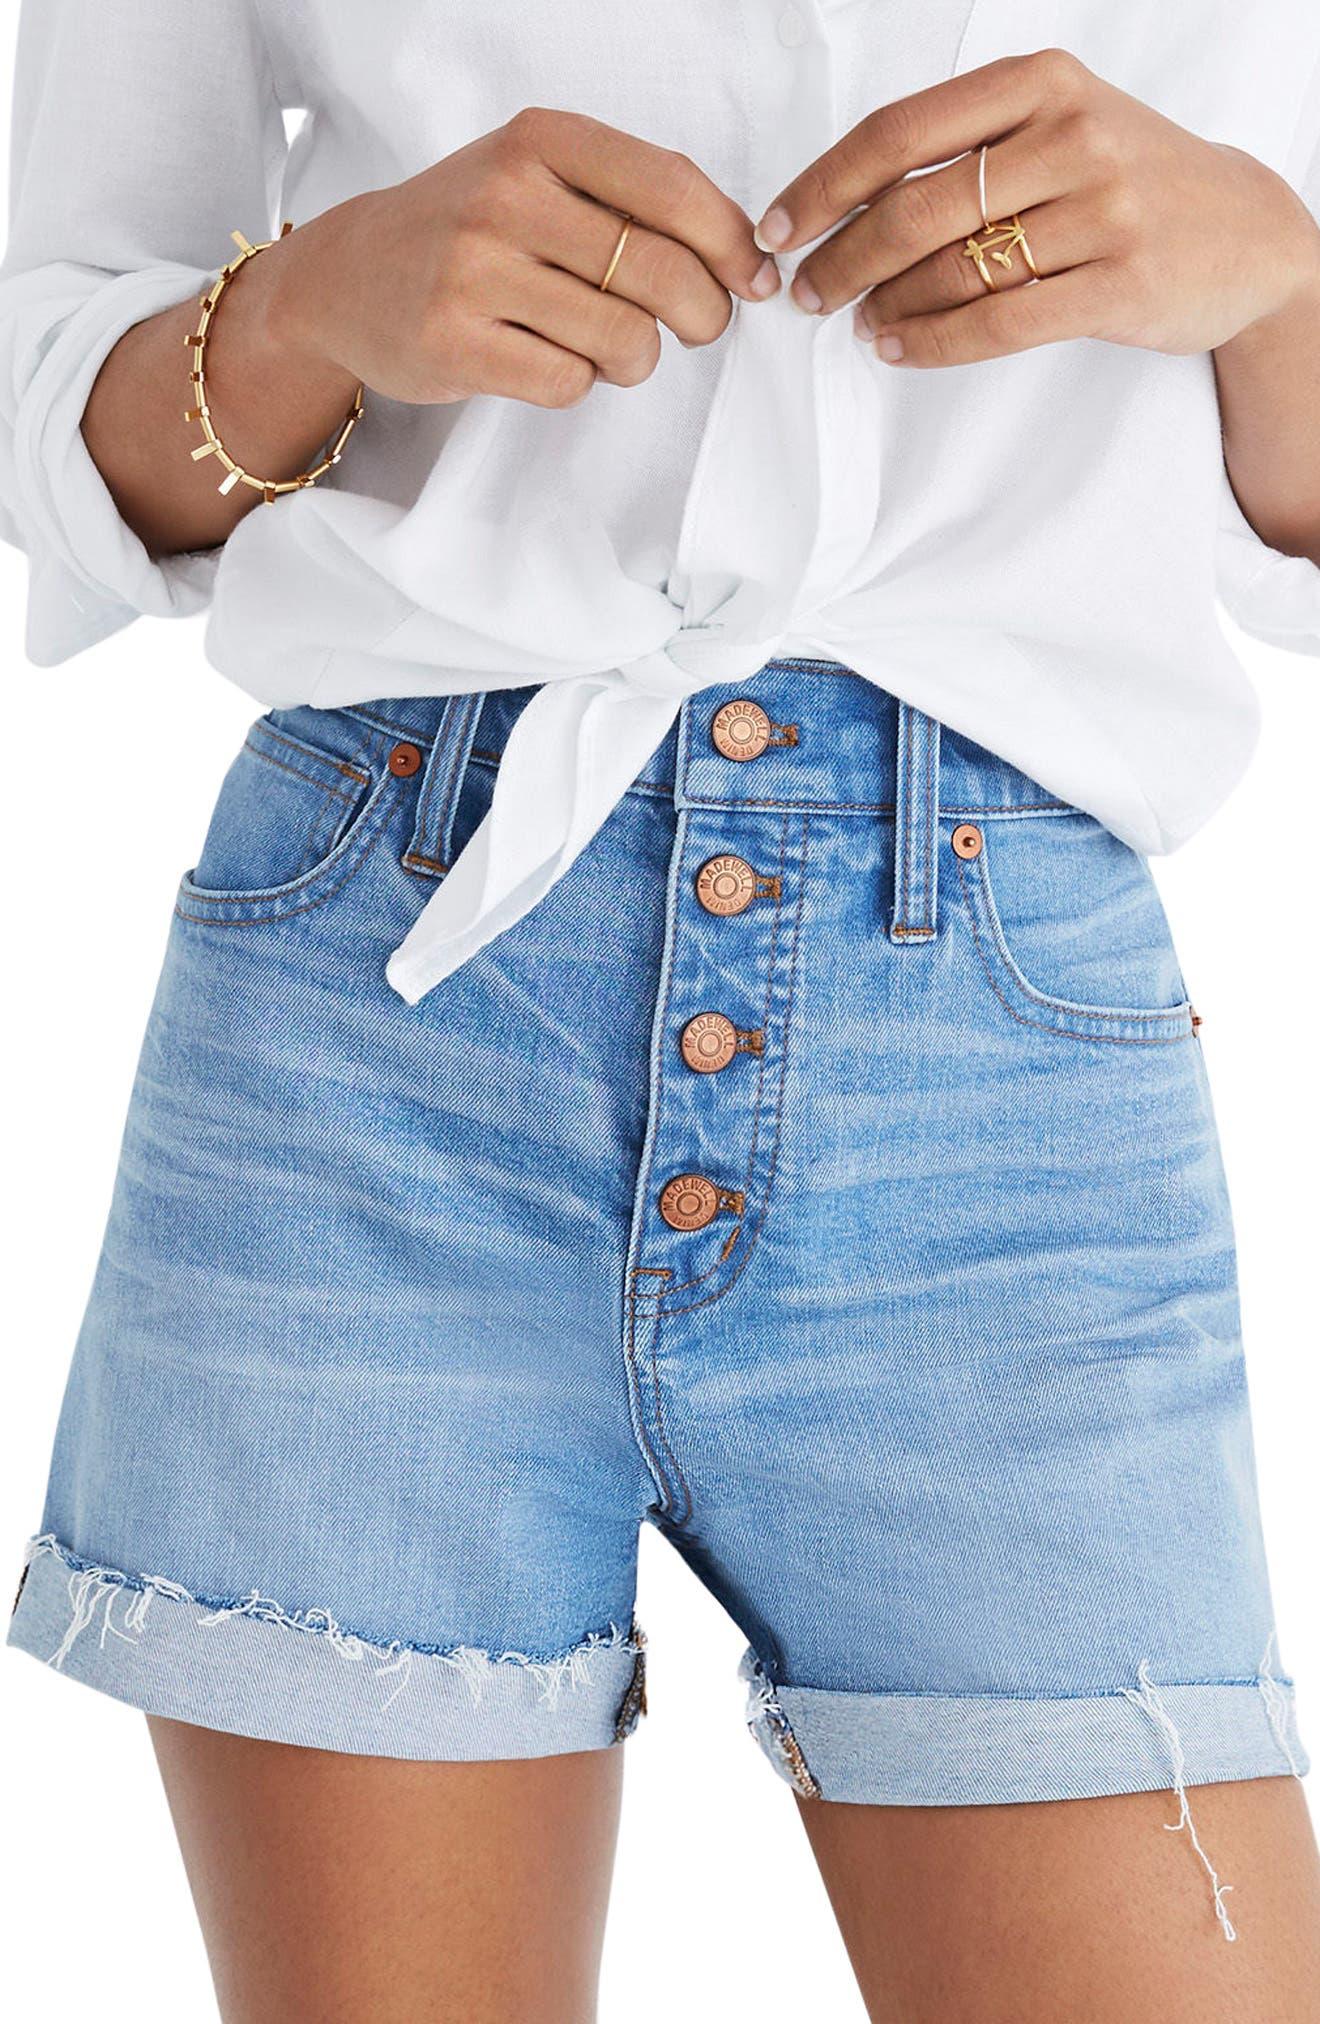 MADEWELL Button Front High Waist Denim Shorts, Main, color, 400